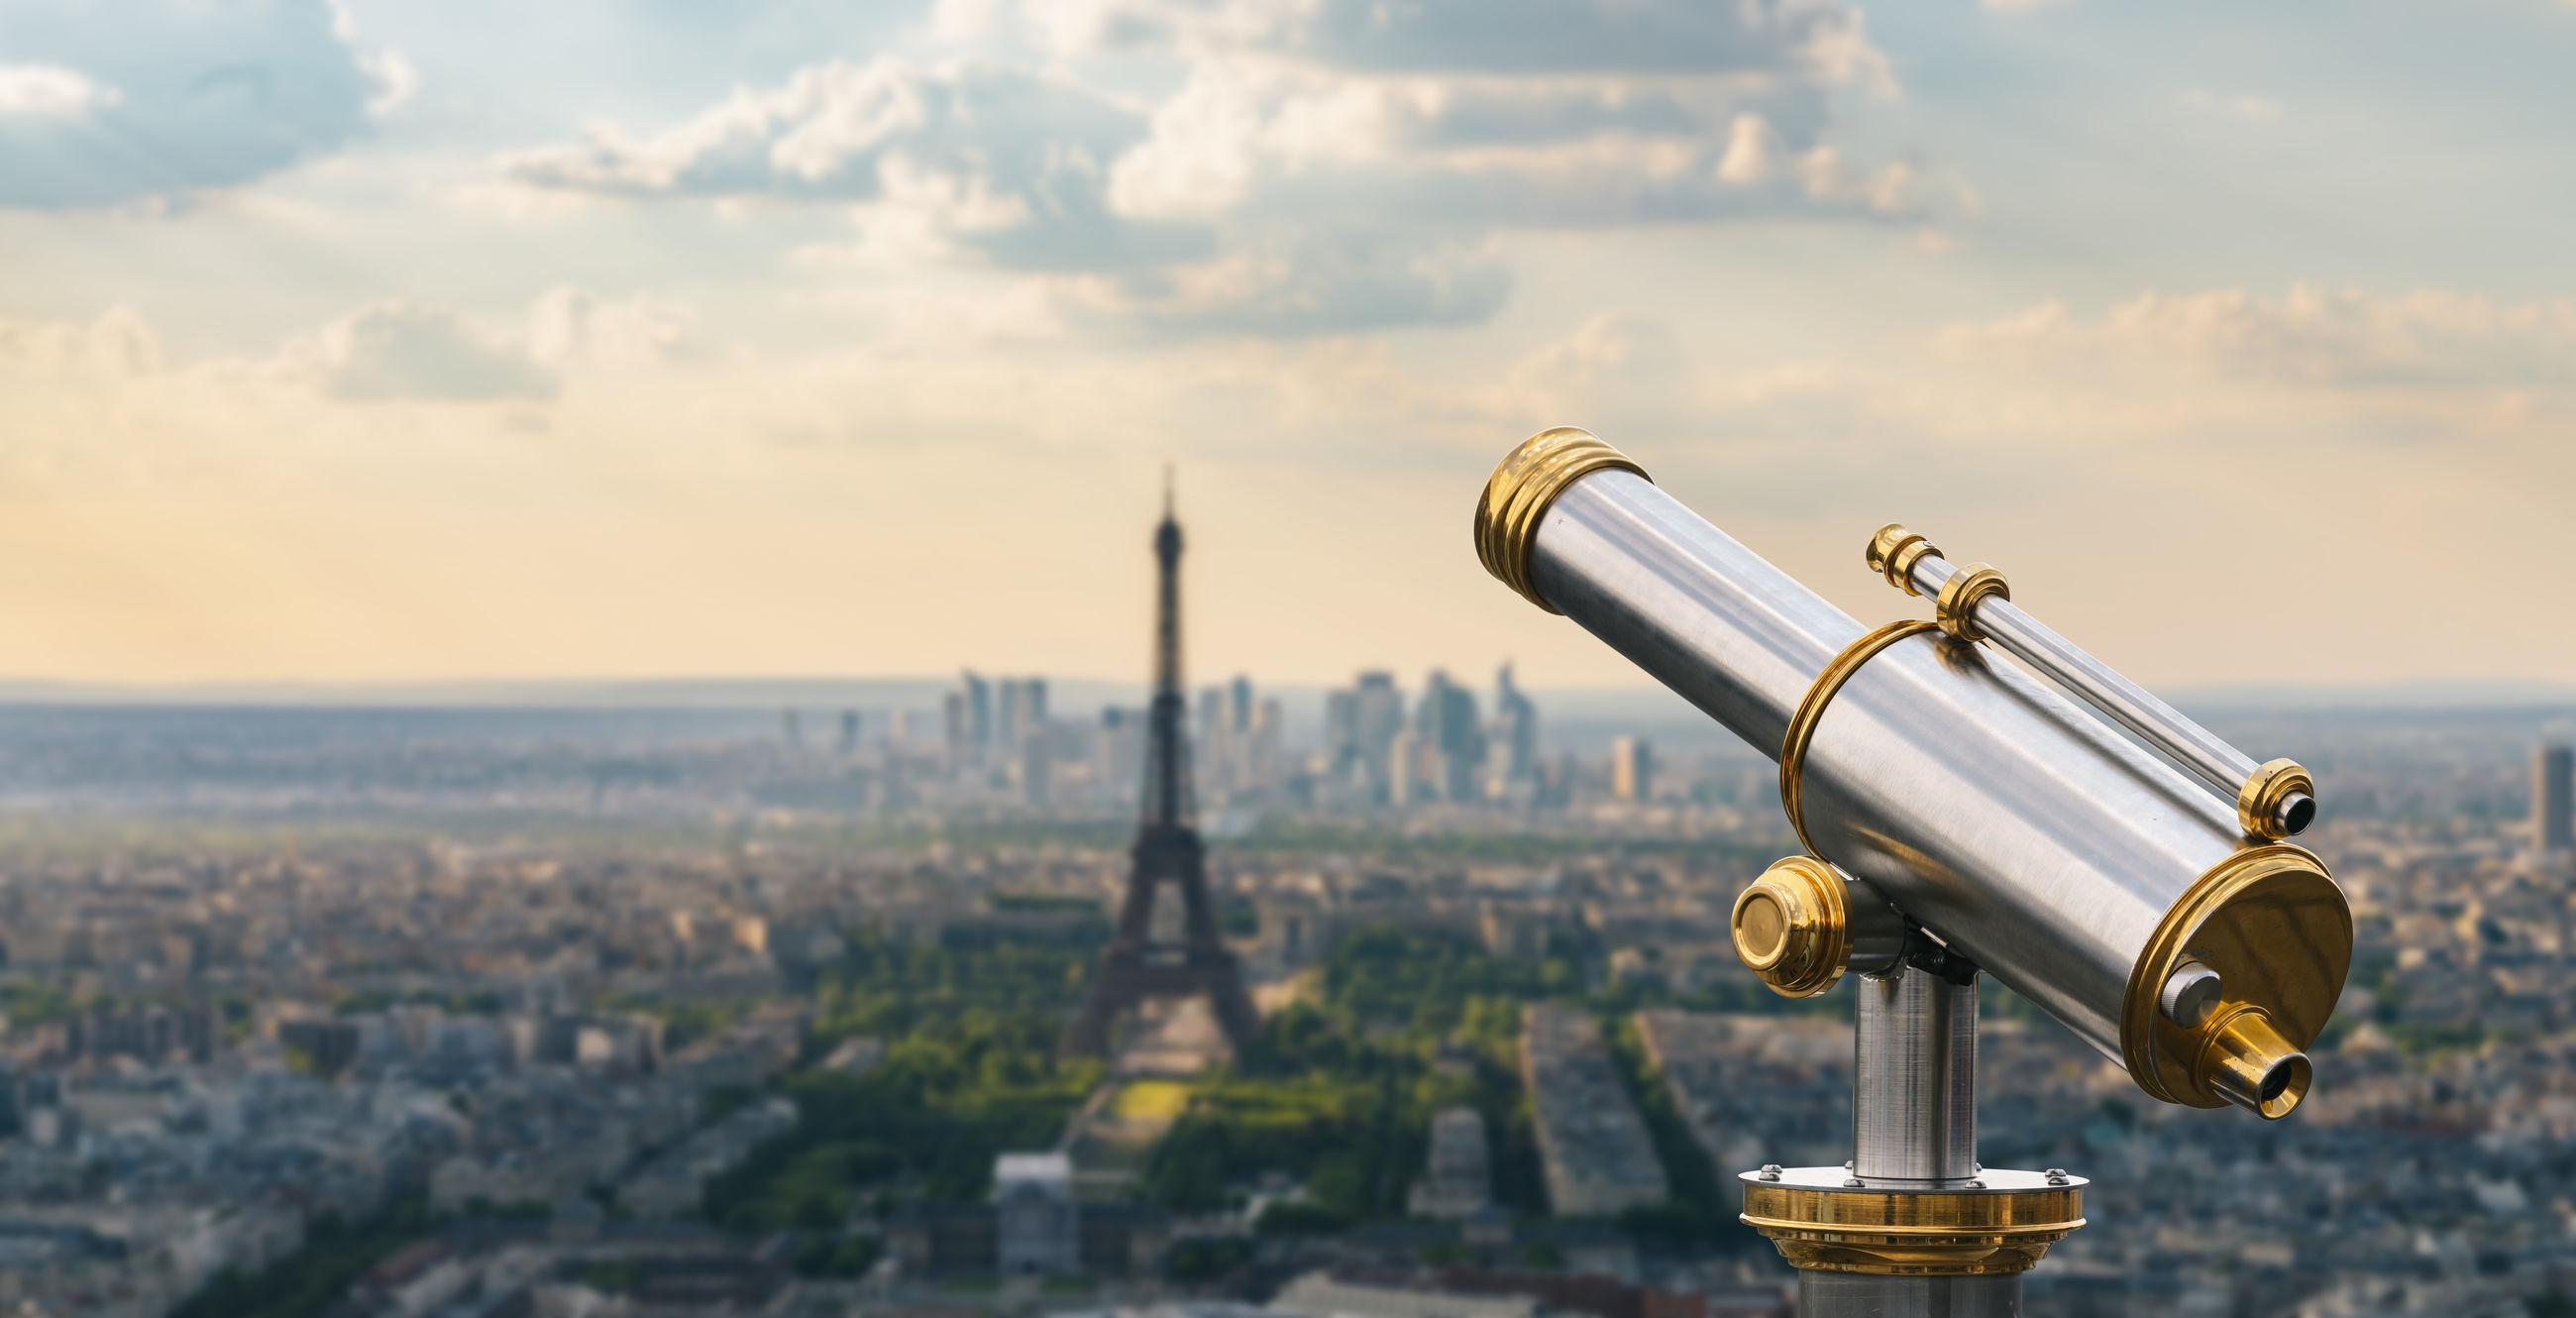 Coin-operated binoculars against eiffel tower